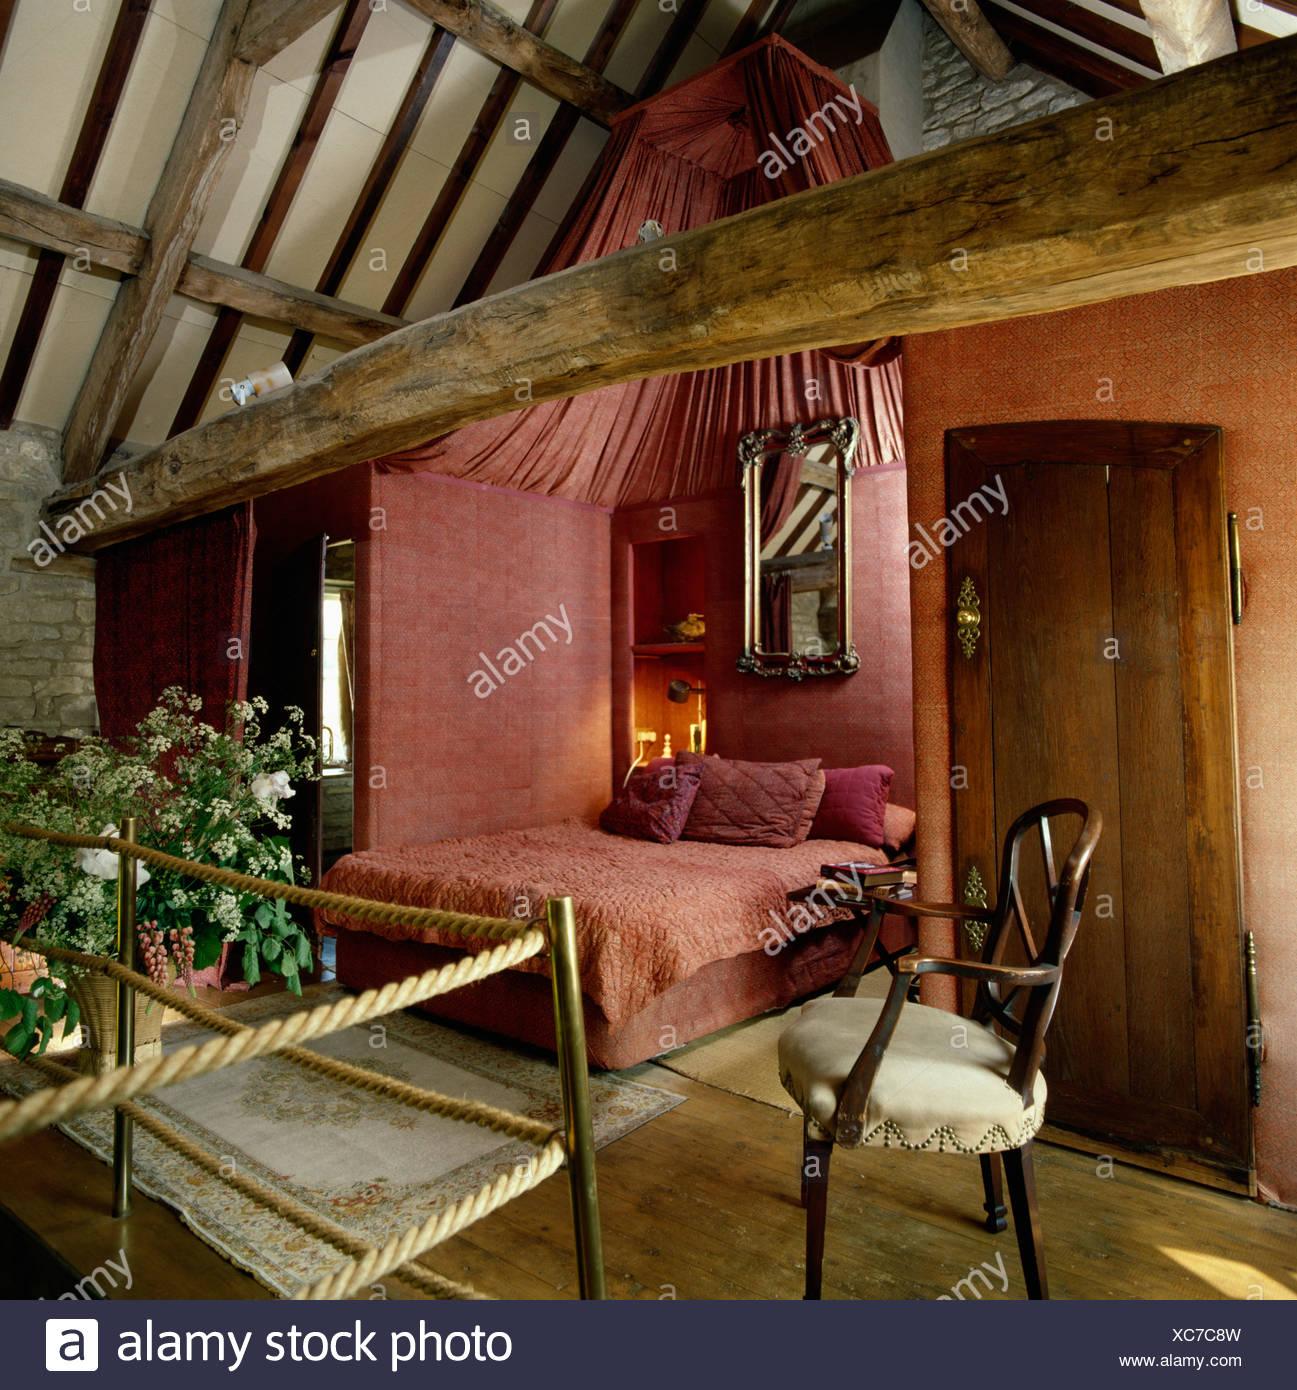 chambre en alc u00f4ve avec tissu rose murs et plafond  u00e0 l u0026 39  u00e9tage mezzanine sous tente dans la r u00e9gion